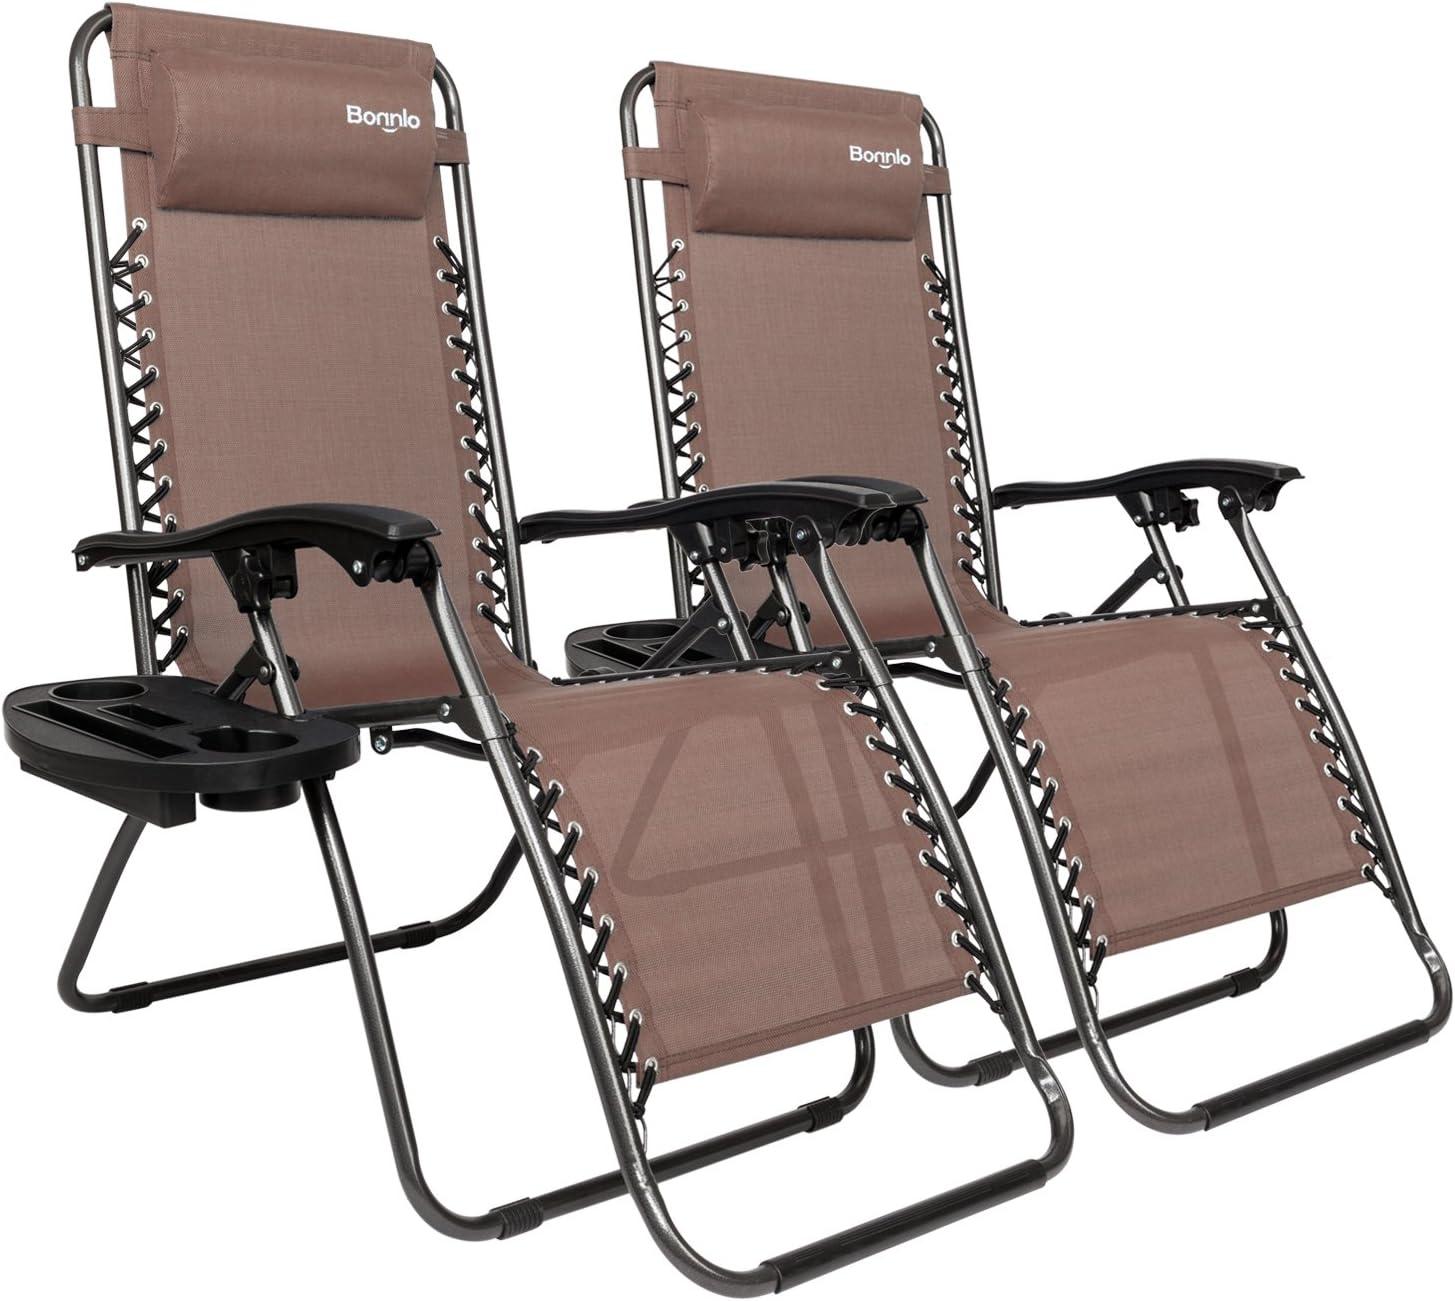 5 ☆ popular Bonnlo Infinity Zero Gravity Chair San Diego Mall Patio Lounge Chairs Outdoor